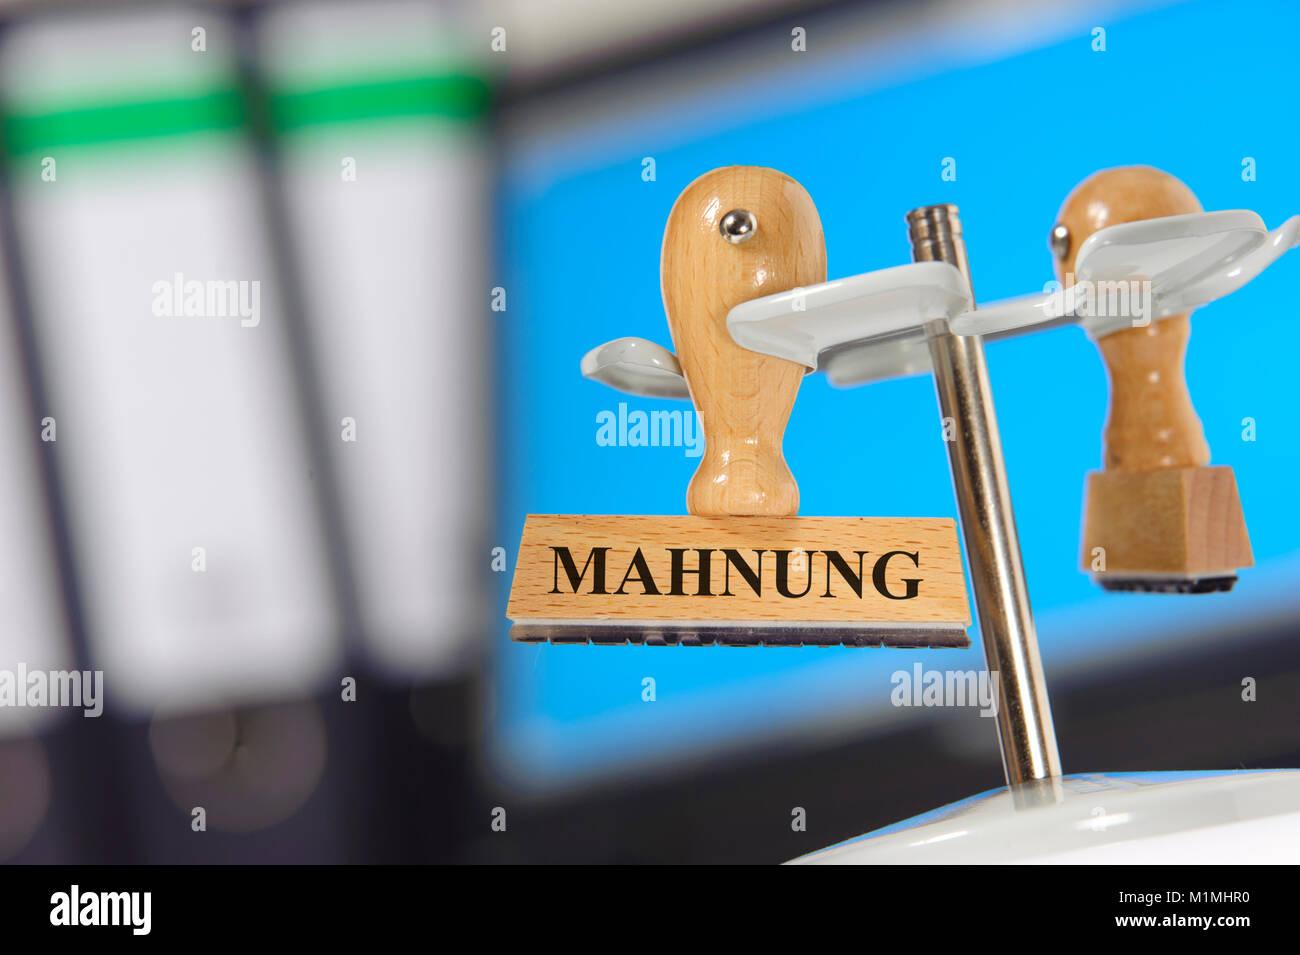 Stempel mit Mahnung - Stock Image